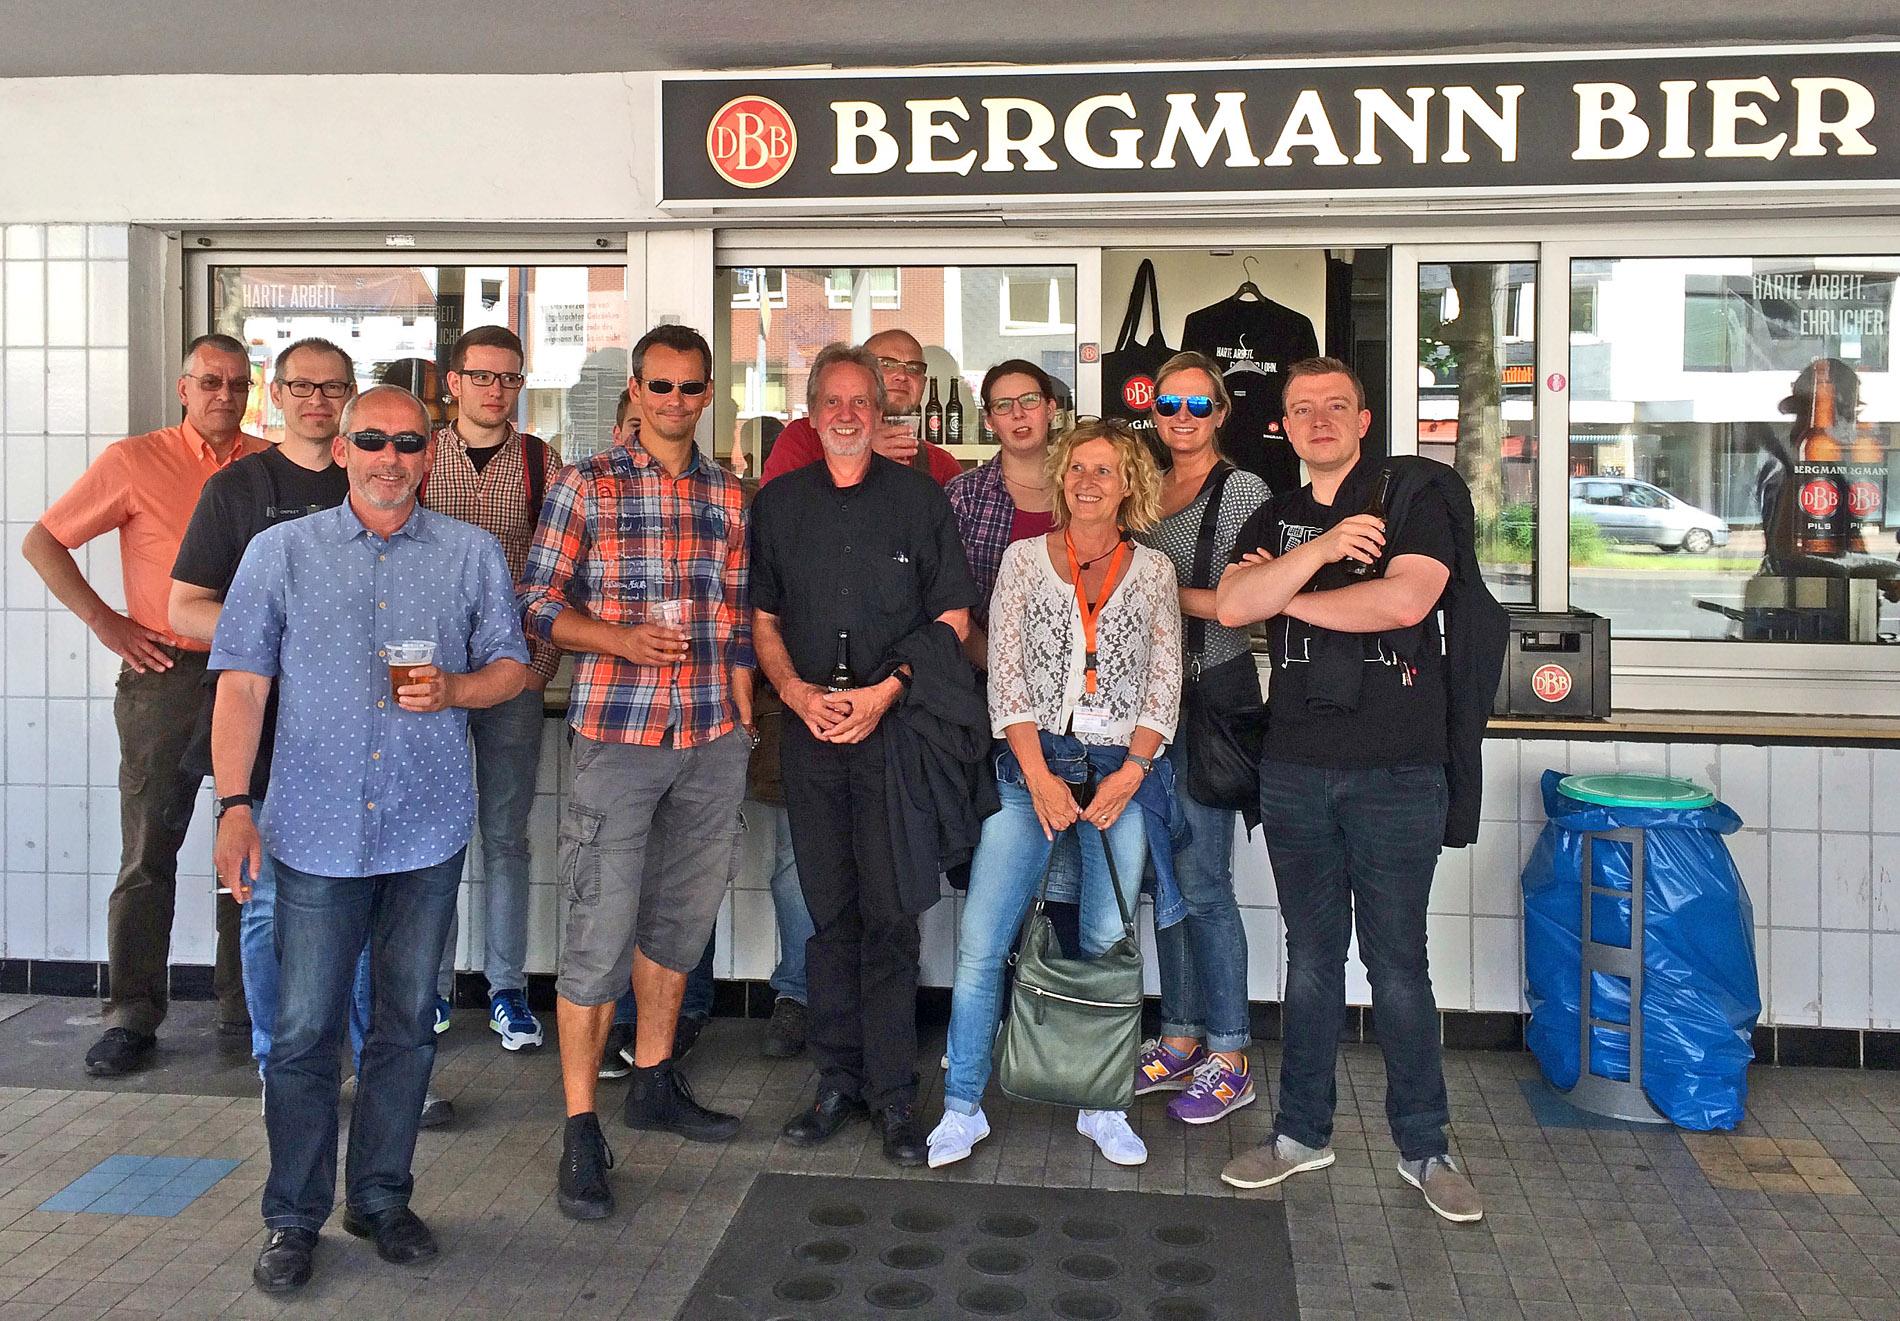 20160610-Stadtkernobst-Bierfuehrung-obergaehrig-untergaehrig_